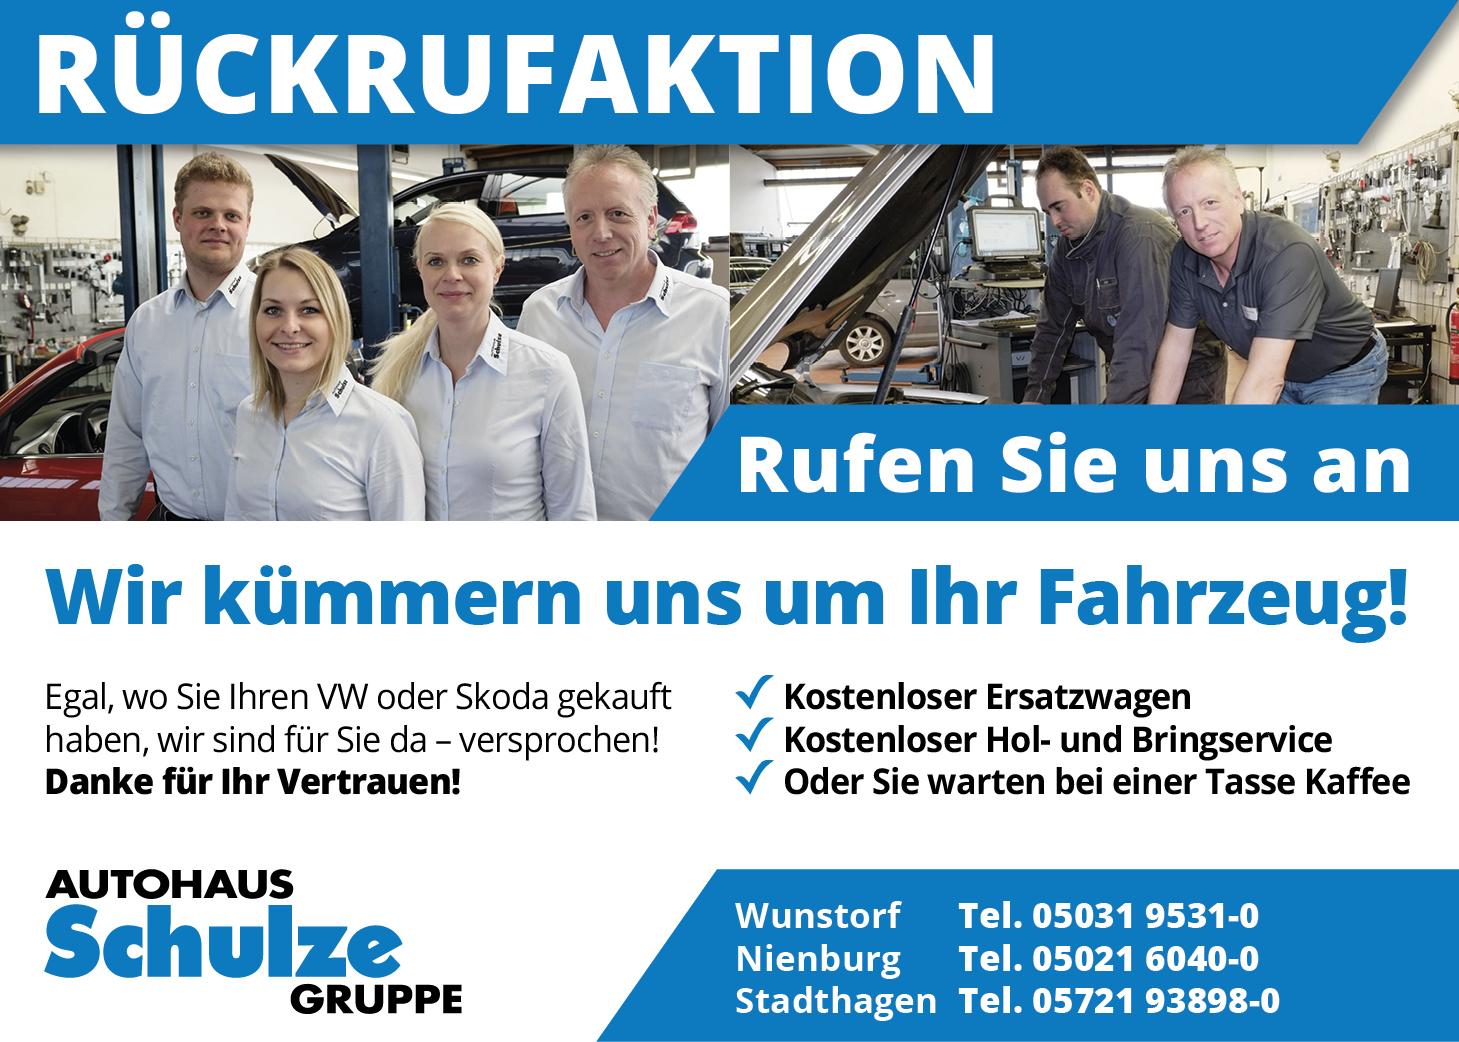 rueckruf-gruppe